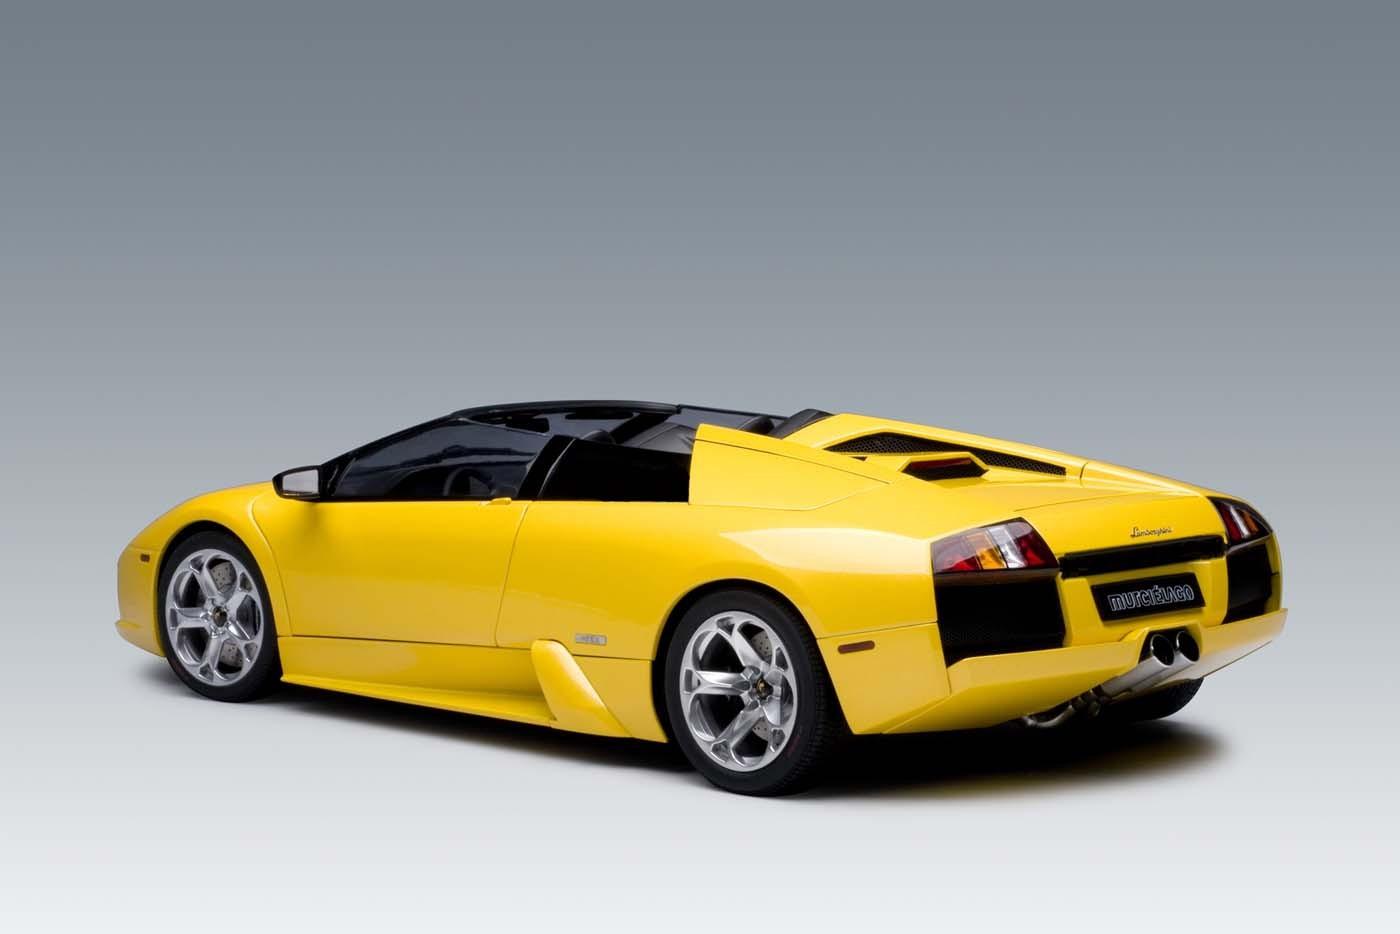 Autoart Die Cast Model Metalic Yellow Lamborghini Murcielago